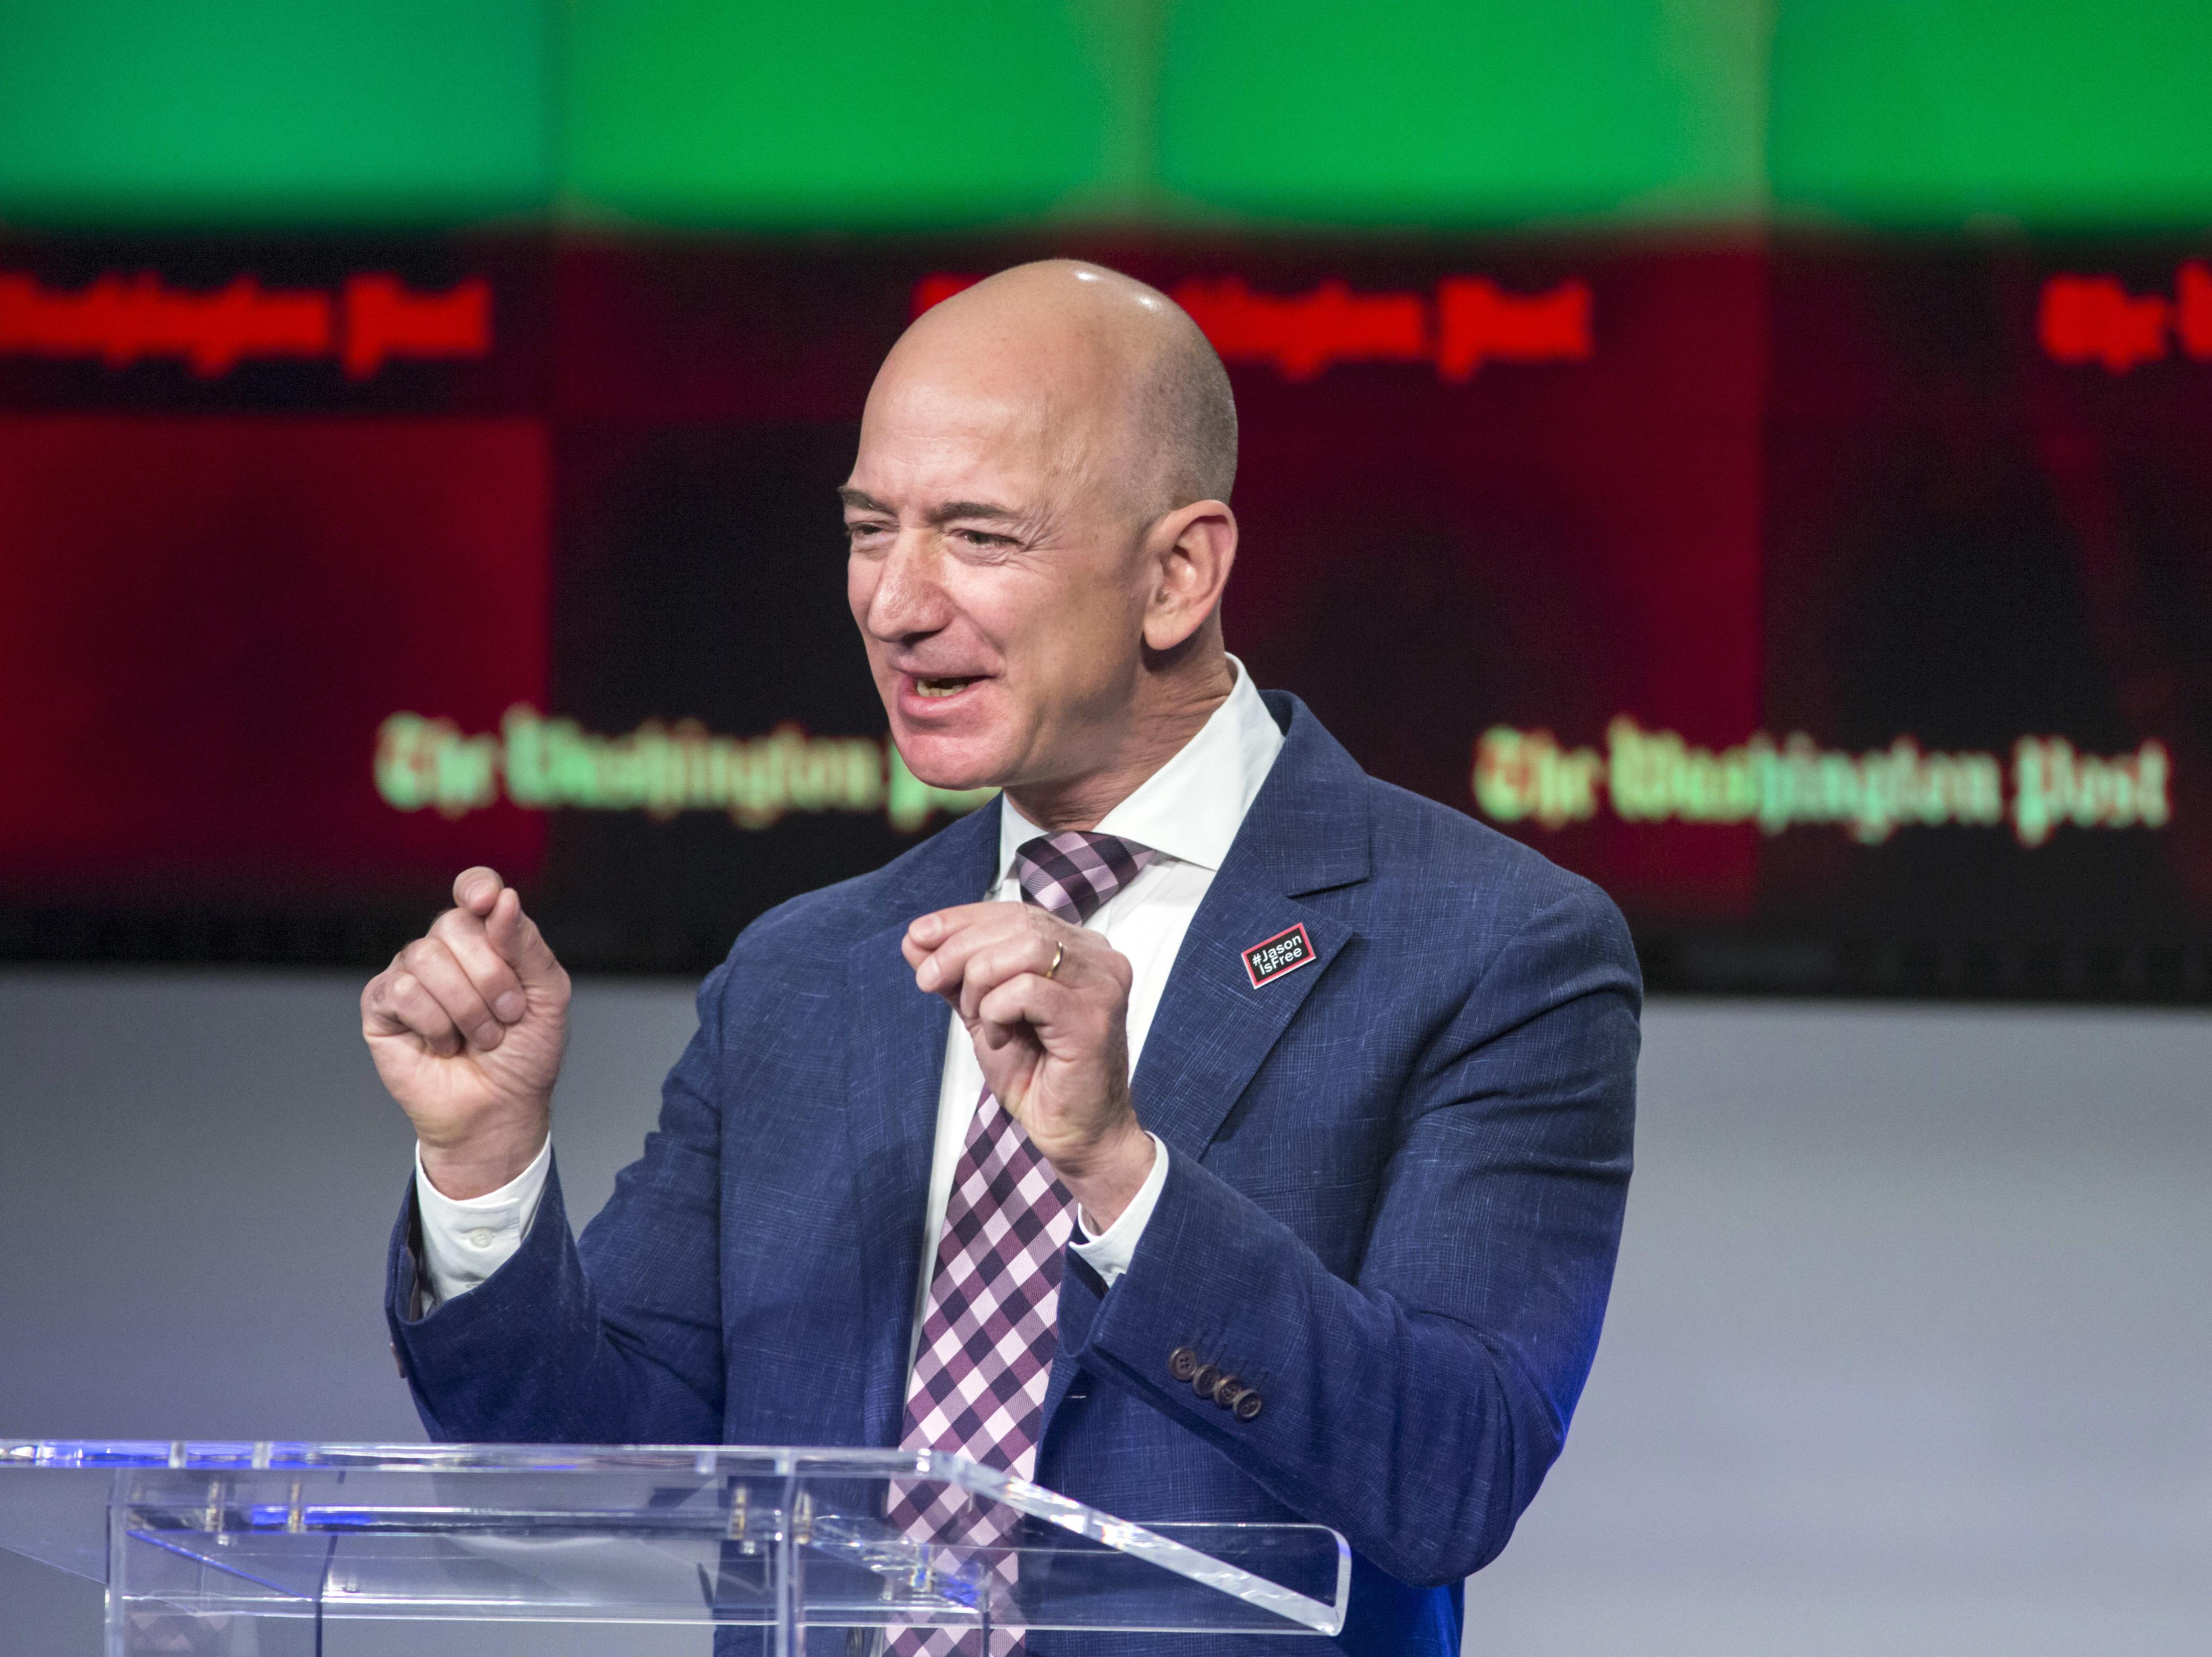 Jeff Bezos, The Saudi Prince and a WhatsApp Hack